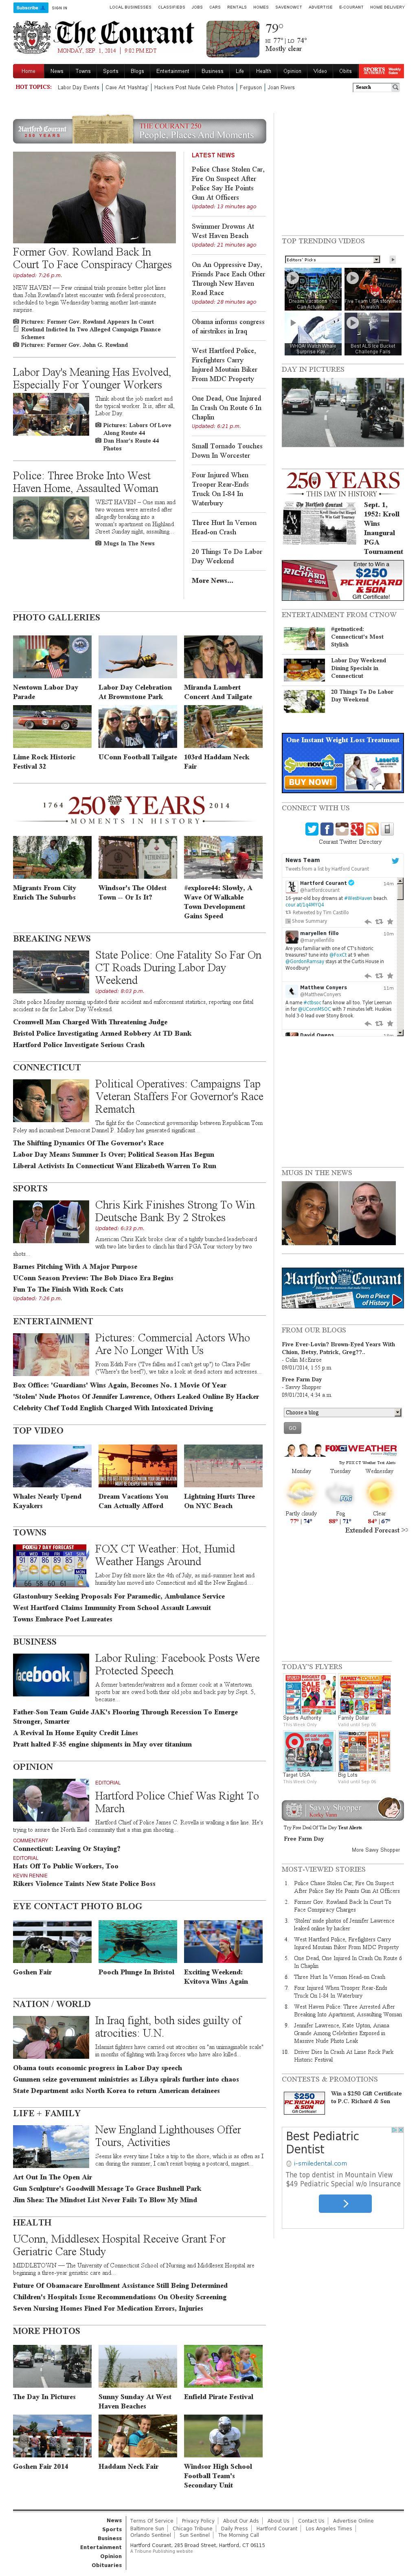 Hartford Courant at Tuesday Sept. 2, 2014, 1:08 a.m. UTC